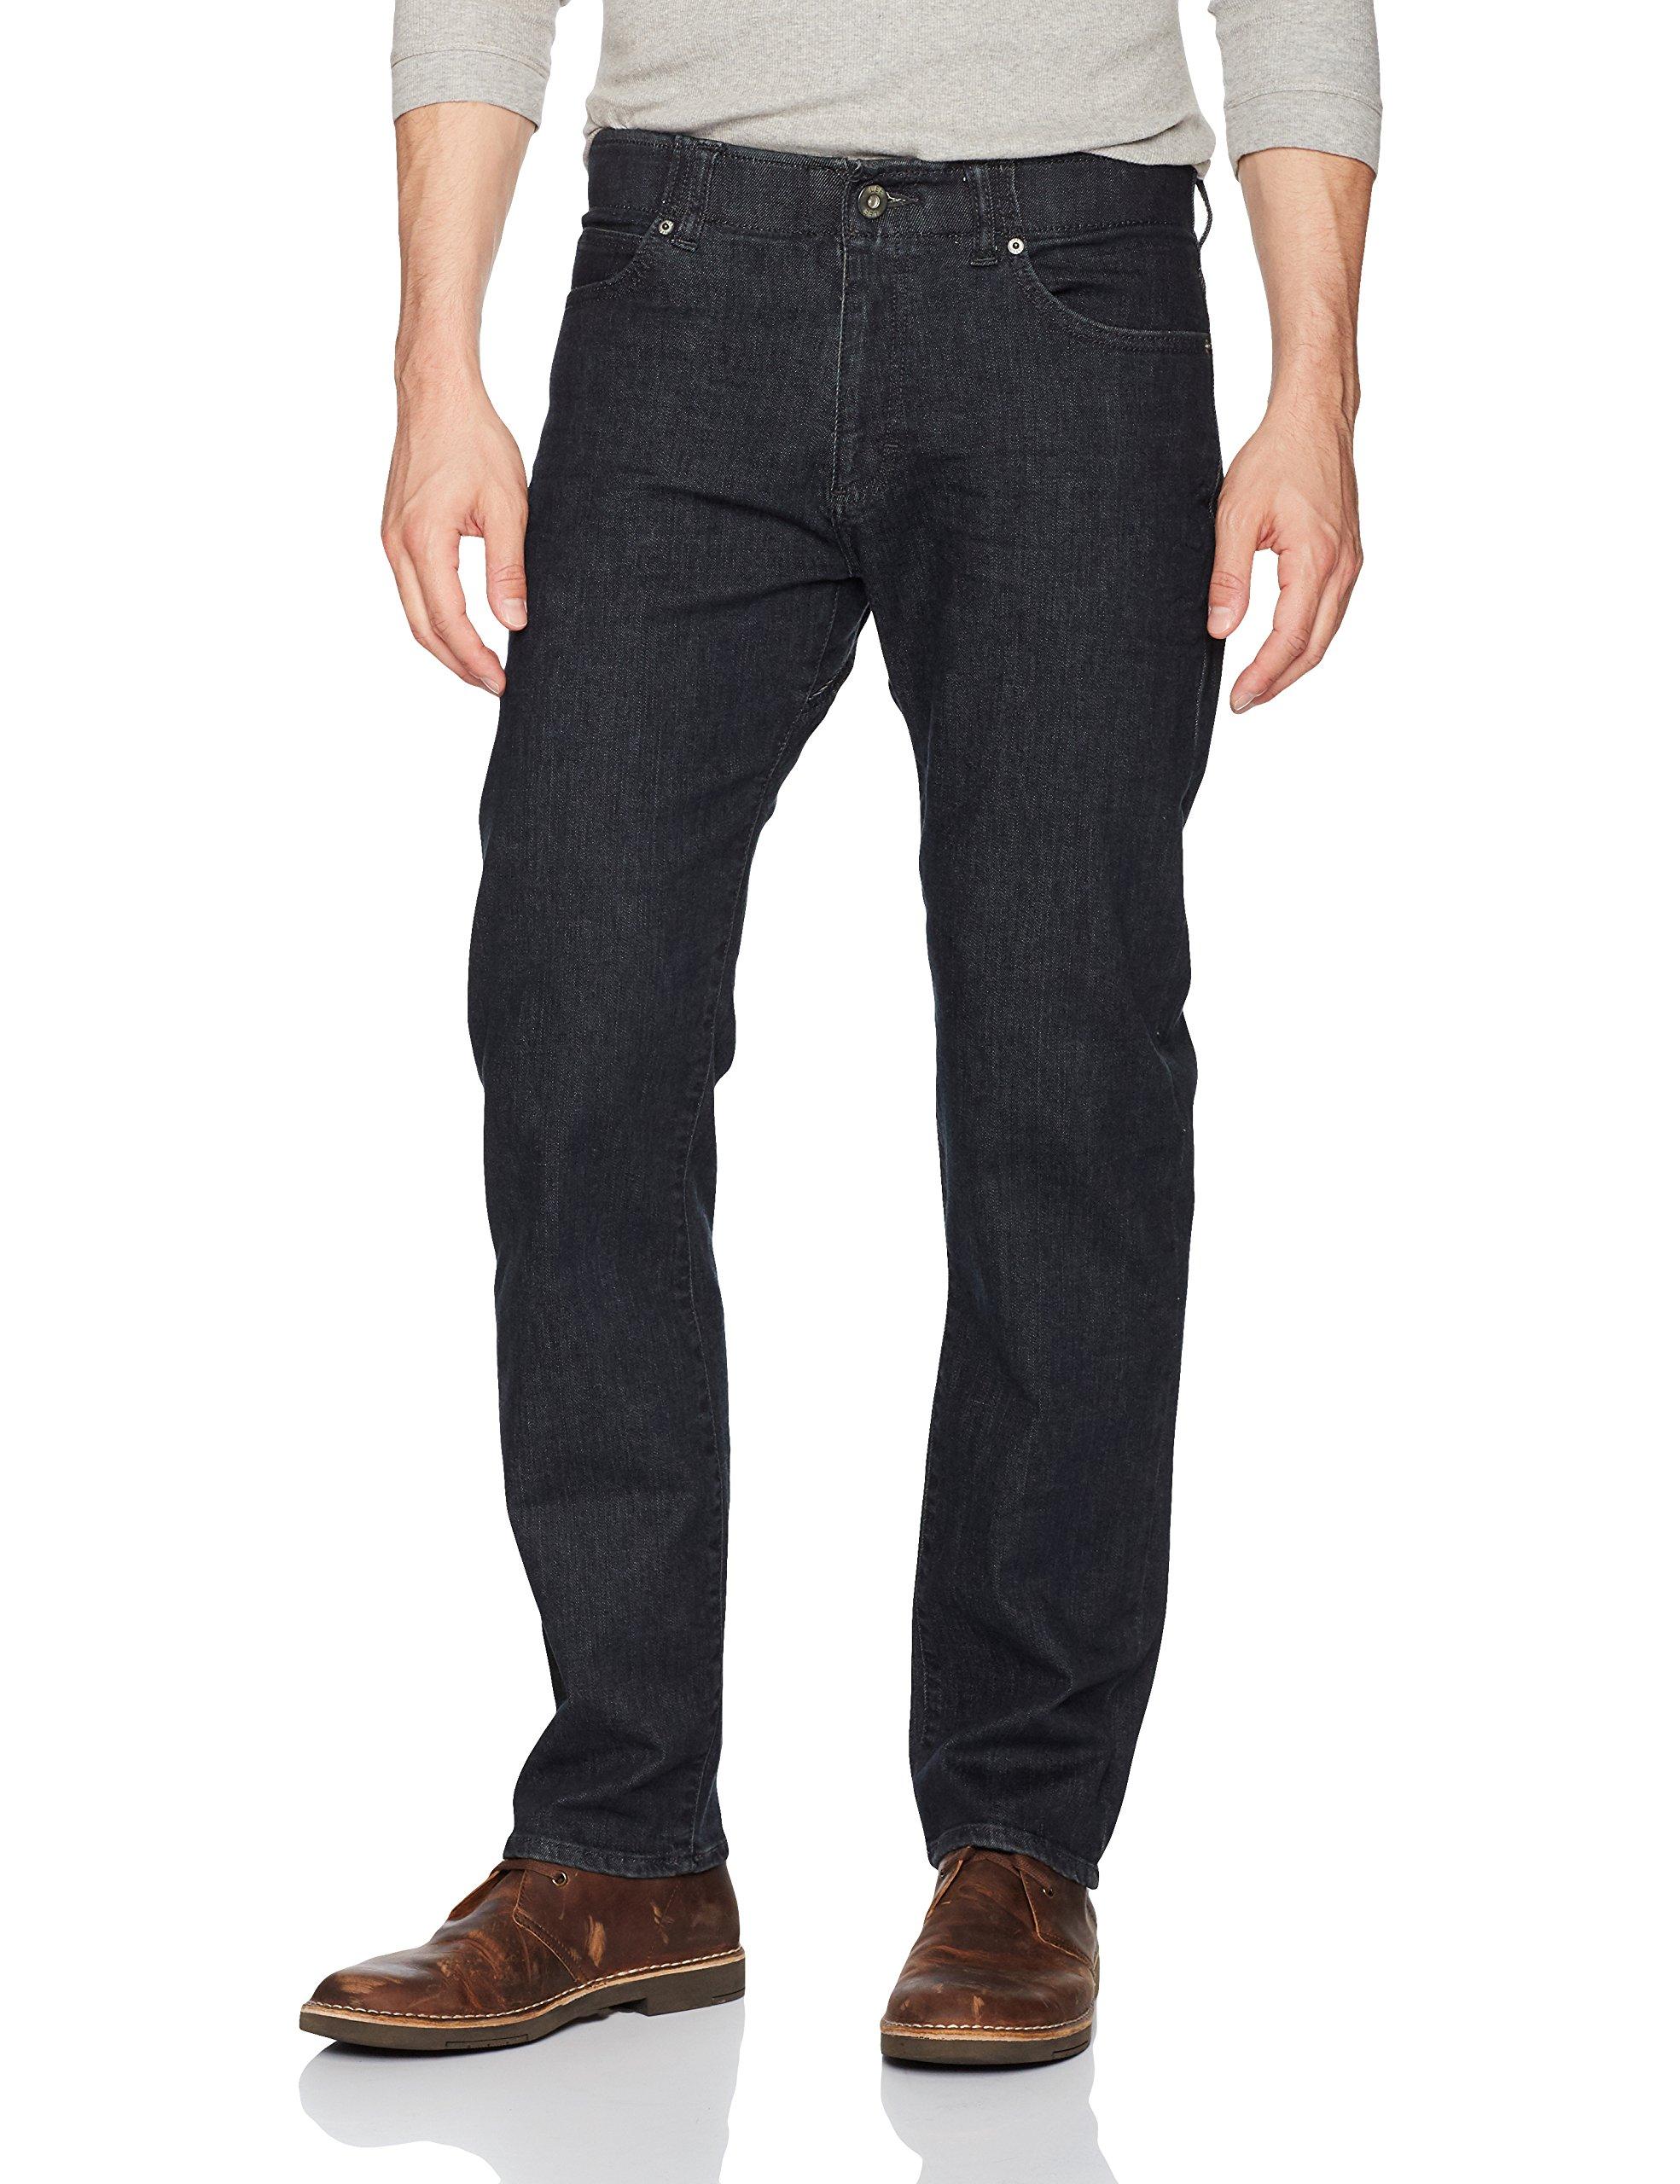 LEE Men's Modern Series Extreme Motion Athletic Jean, Zander, 34W x 30L by LEE (Image #1)